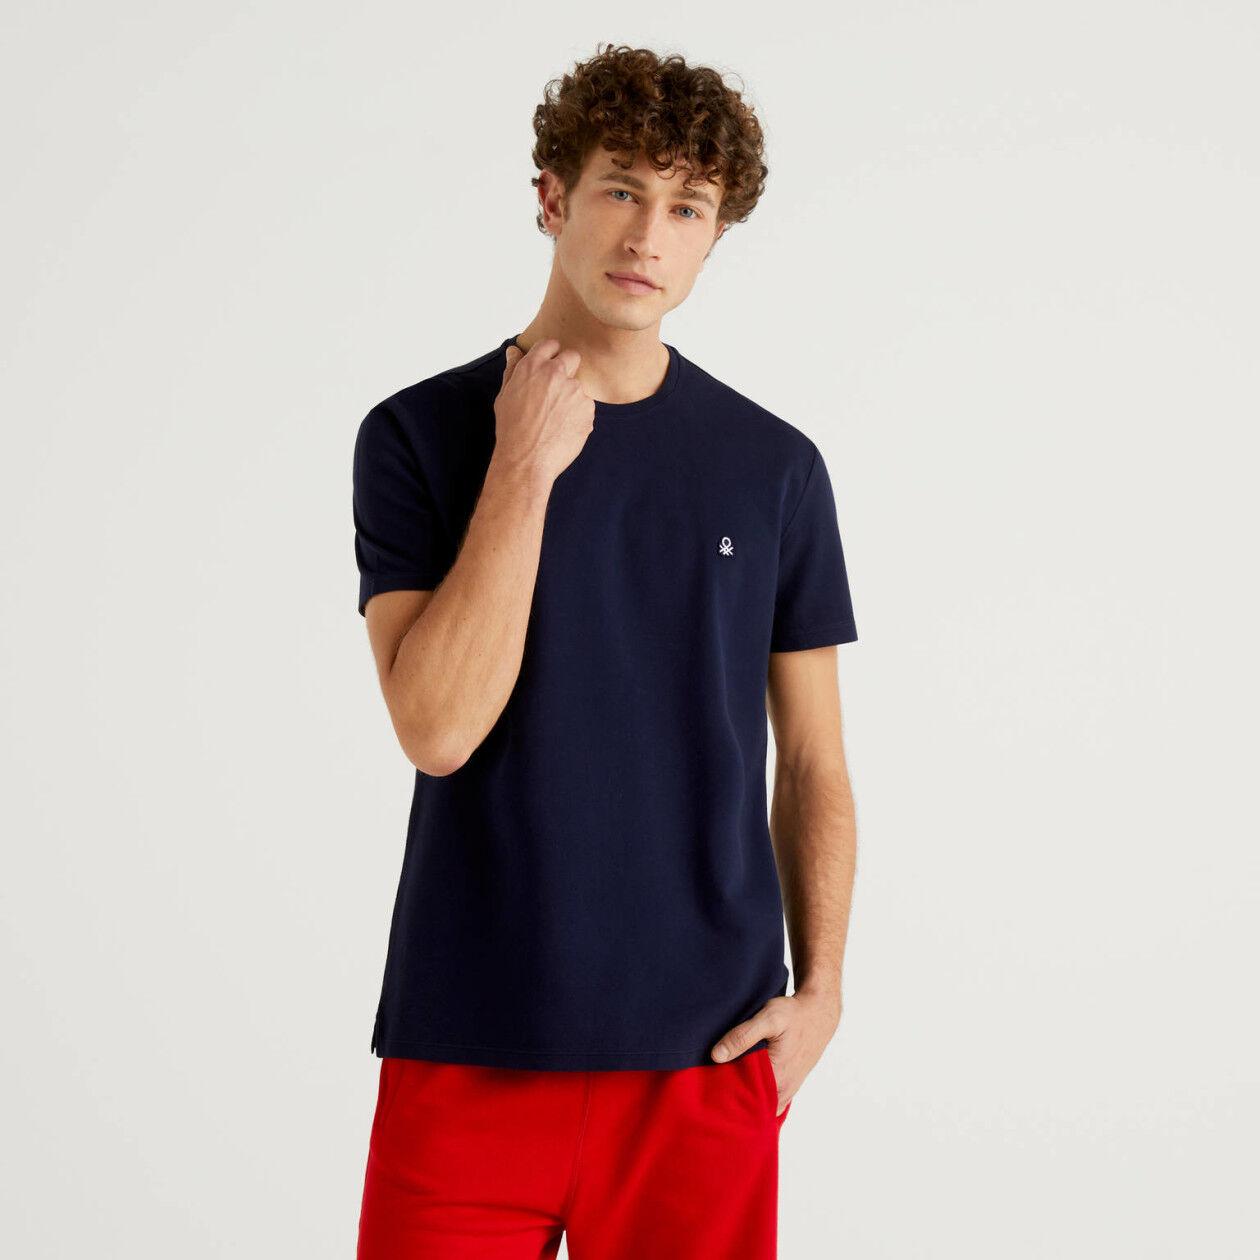 T-shirt in 100% cotton pique